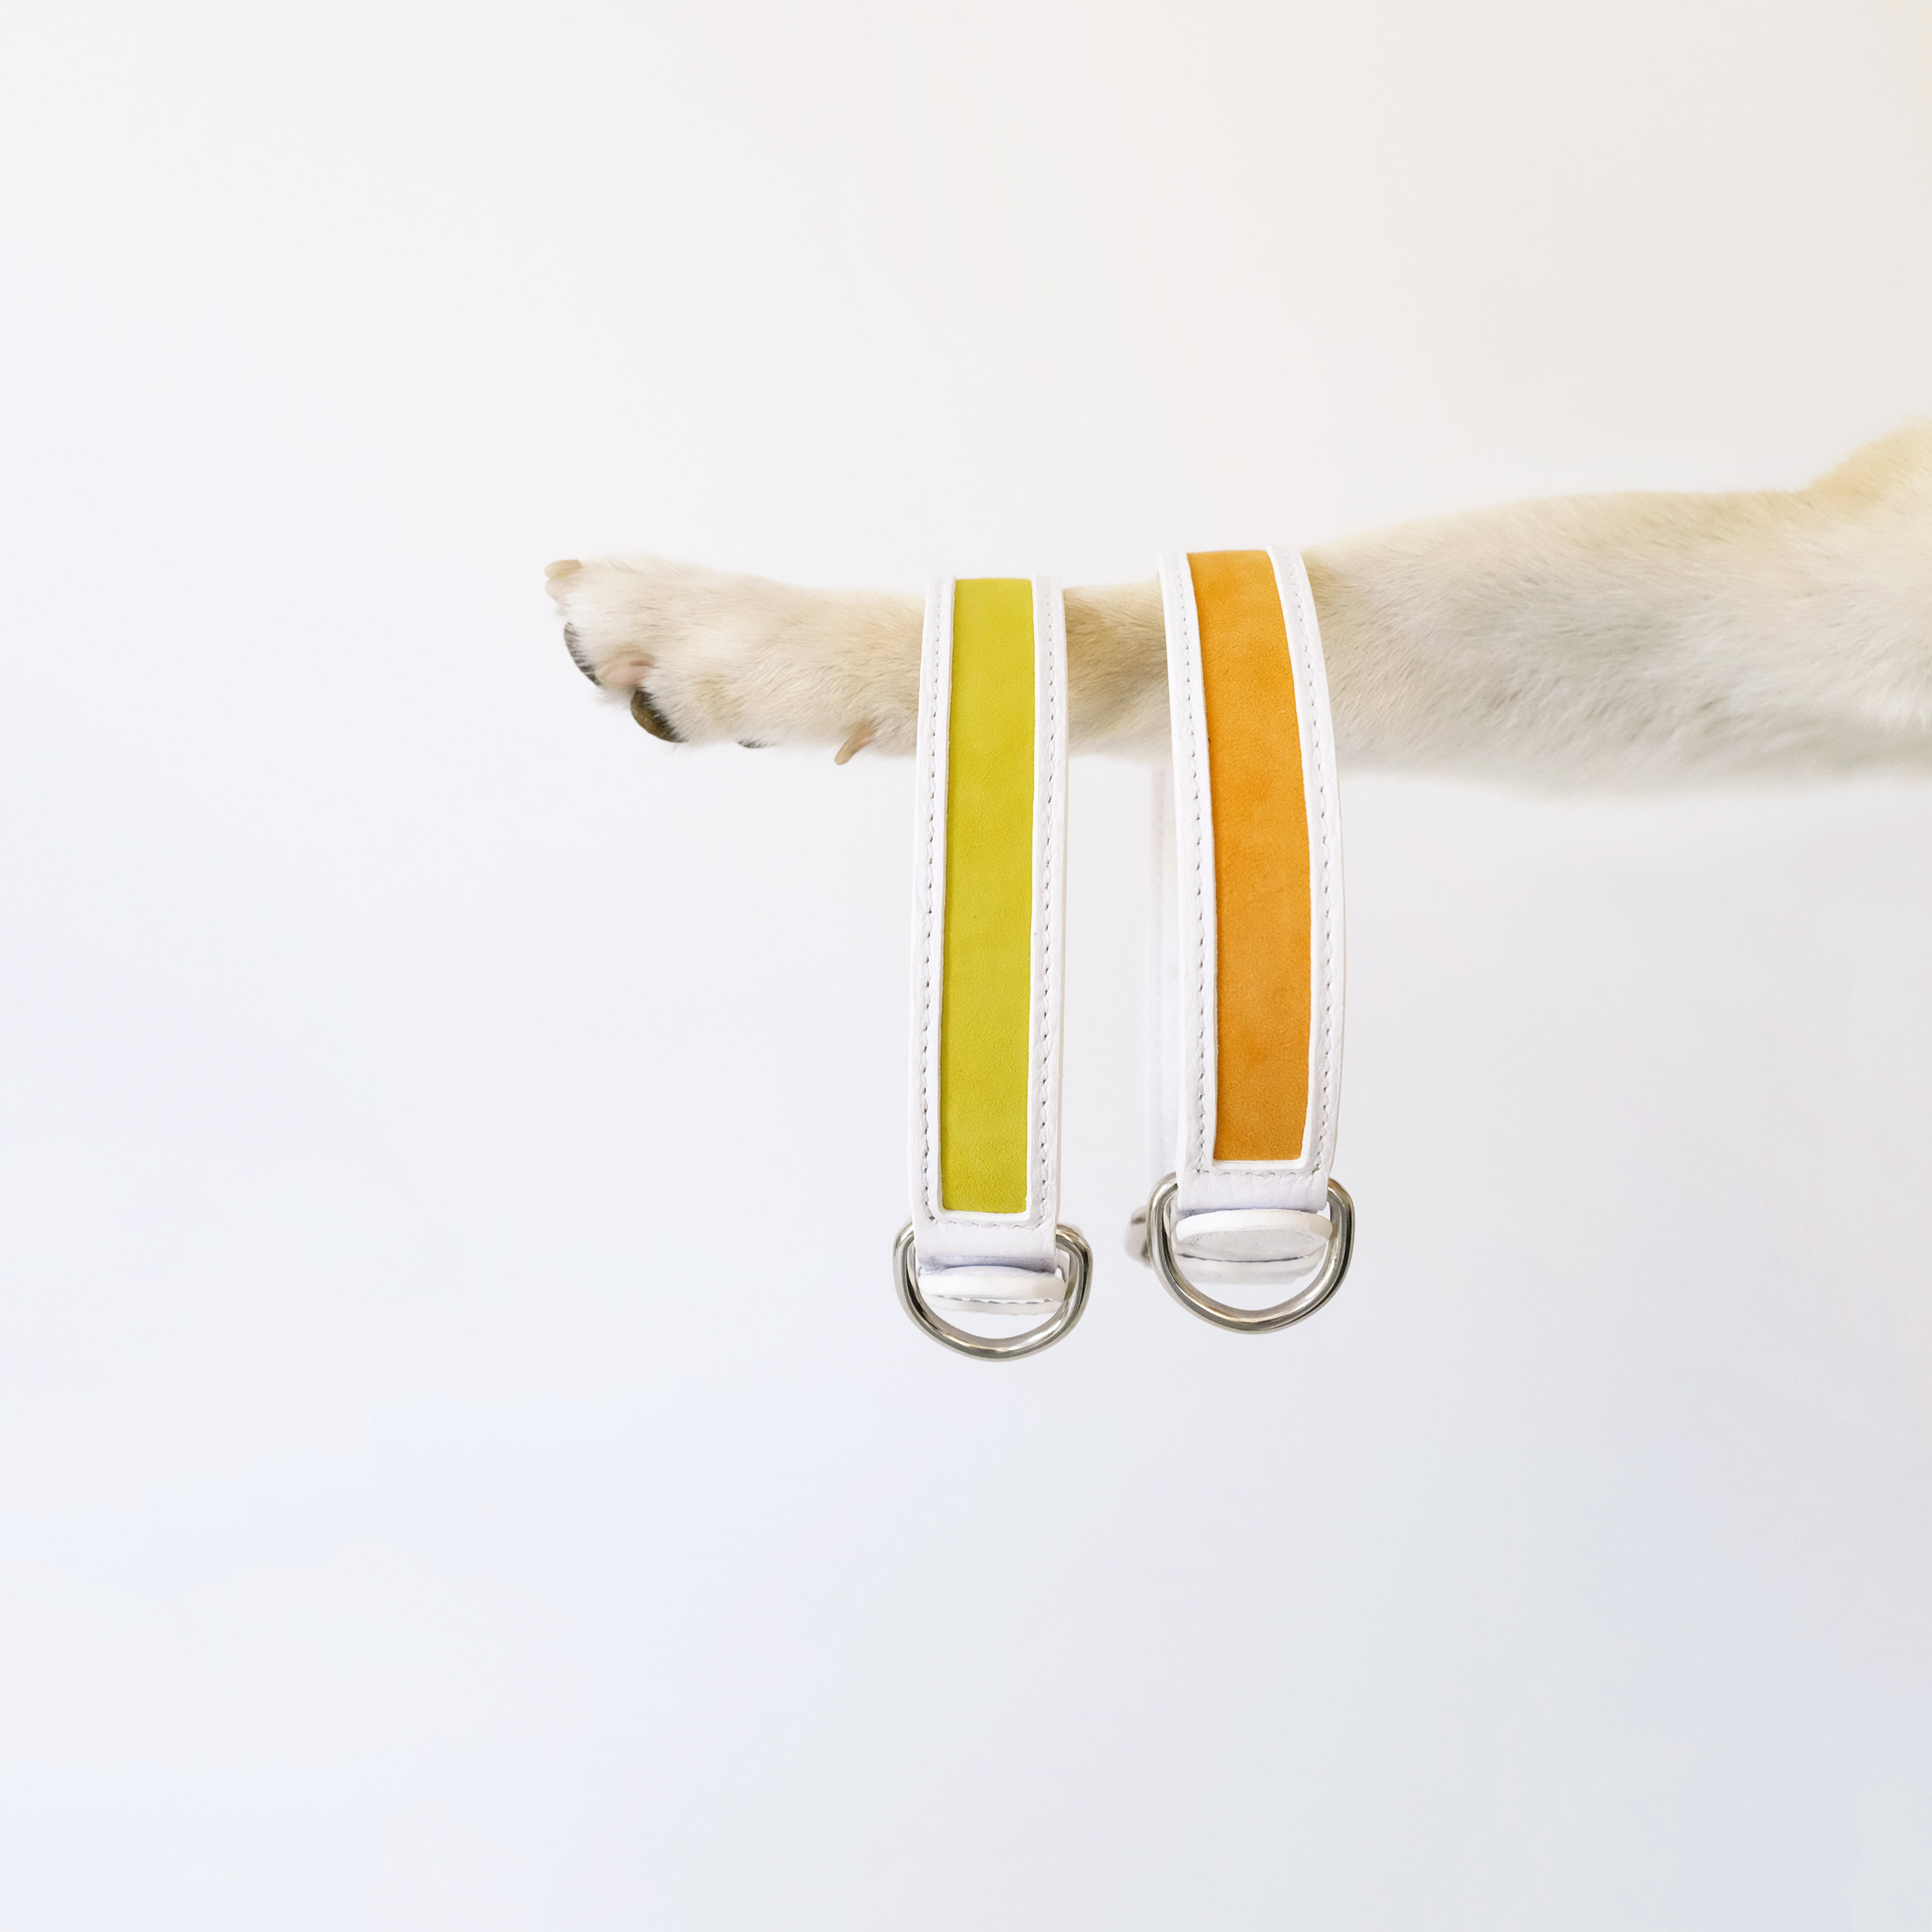 suede dog collars